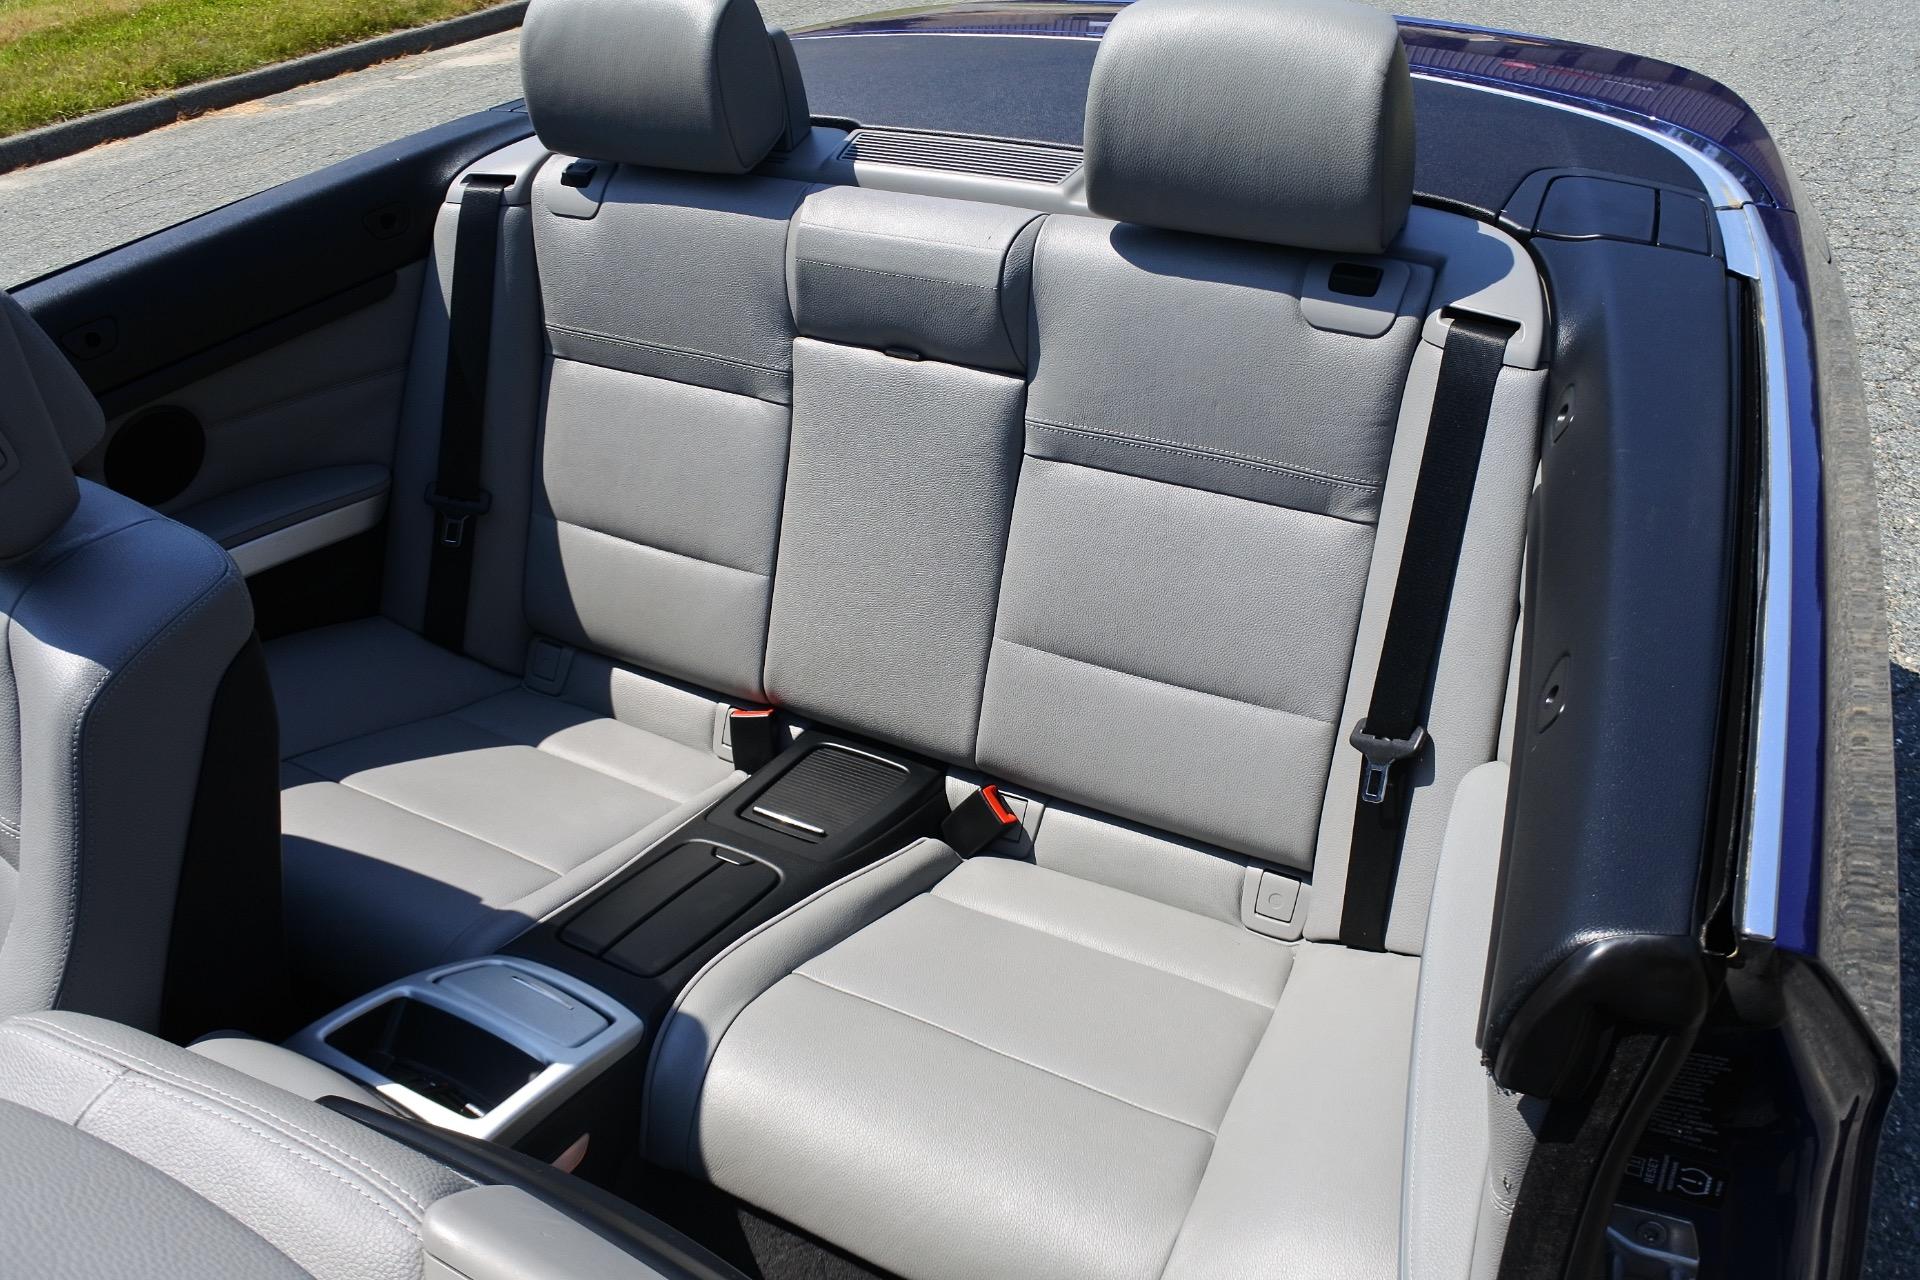 Used 2013 BMW 3 Series 2dr Conv 335i Used 2013 BMW 3 Series 2dr Conv 335i for sale  at Metro West Motorcars LLC in Shrewsbury MA 14